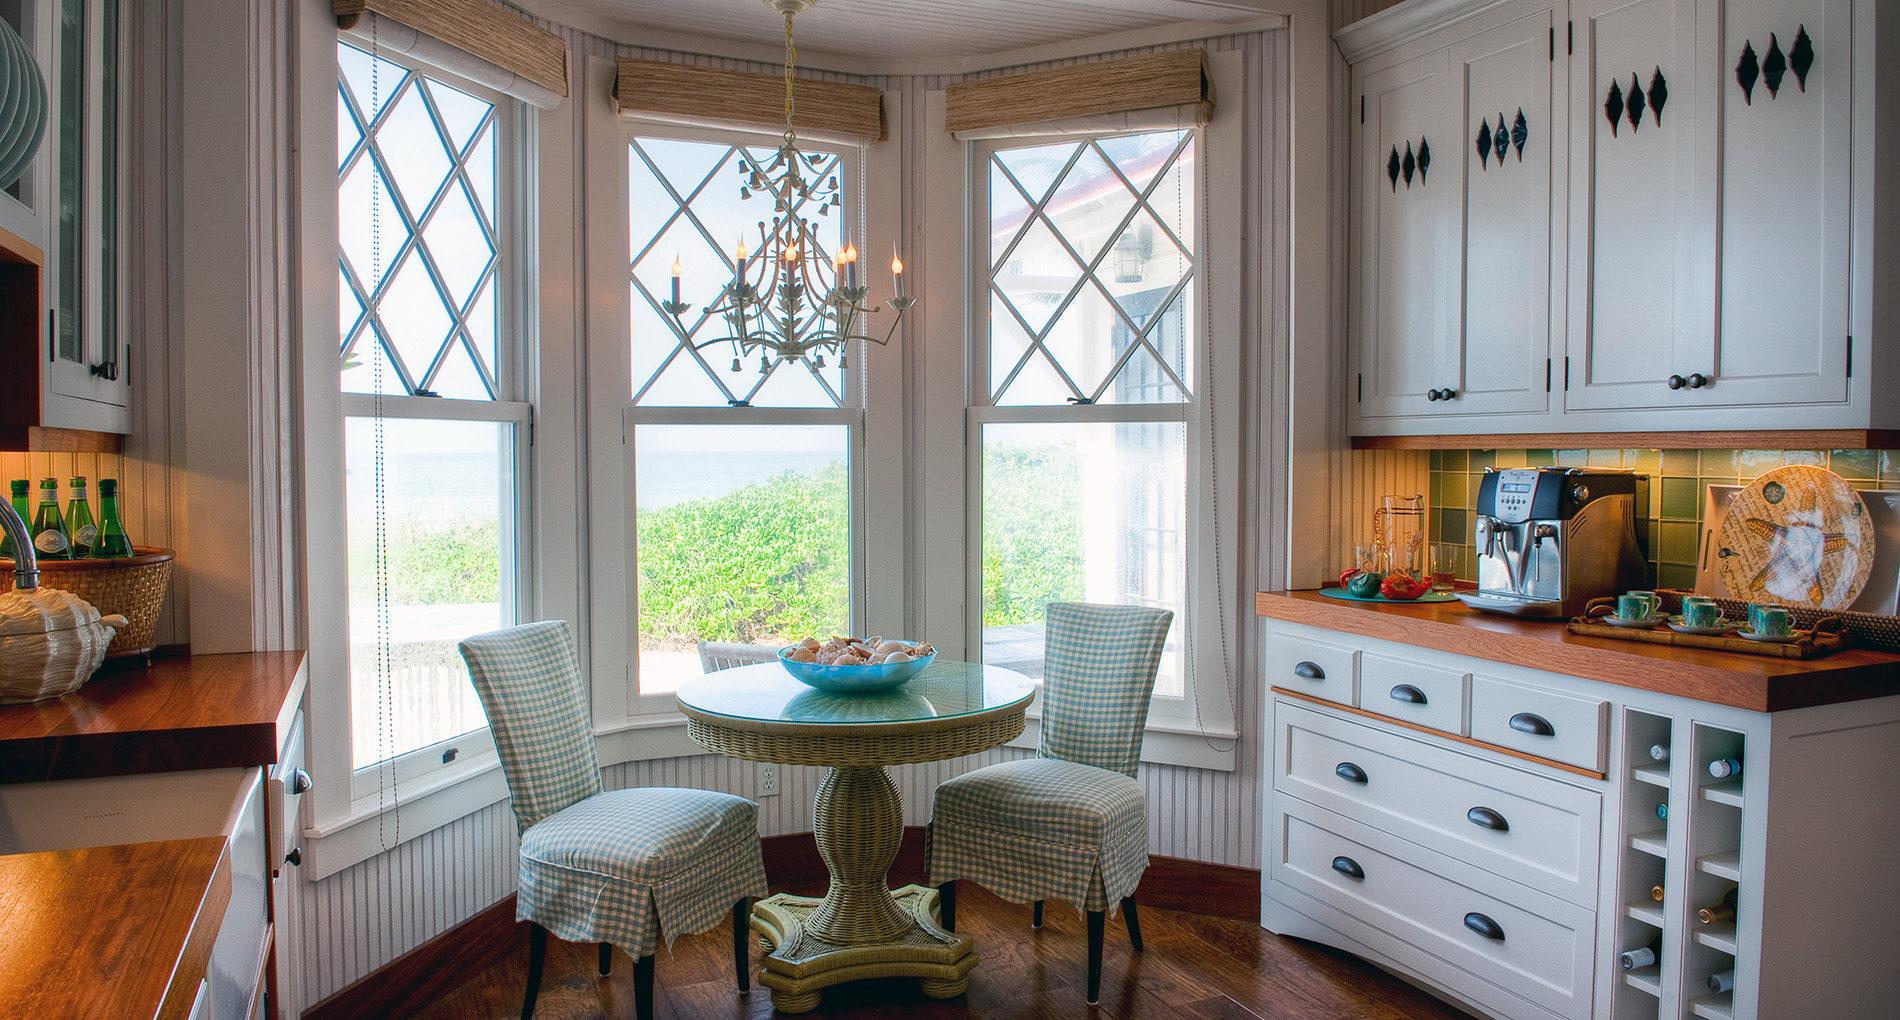 kitchen remodeling & design in bonita springs, fl | alair homes